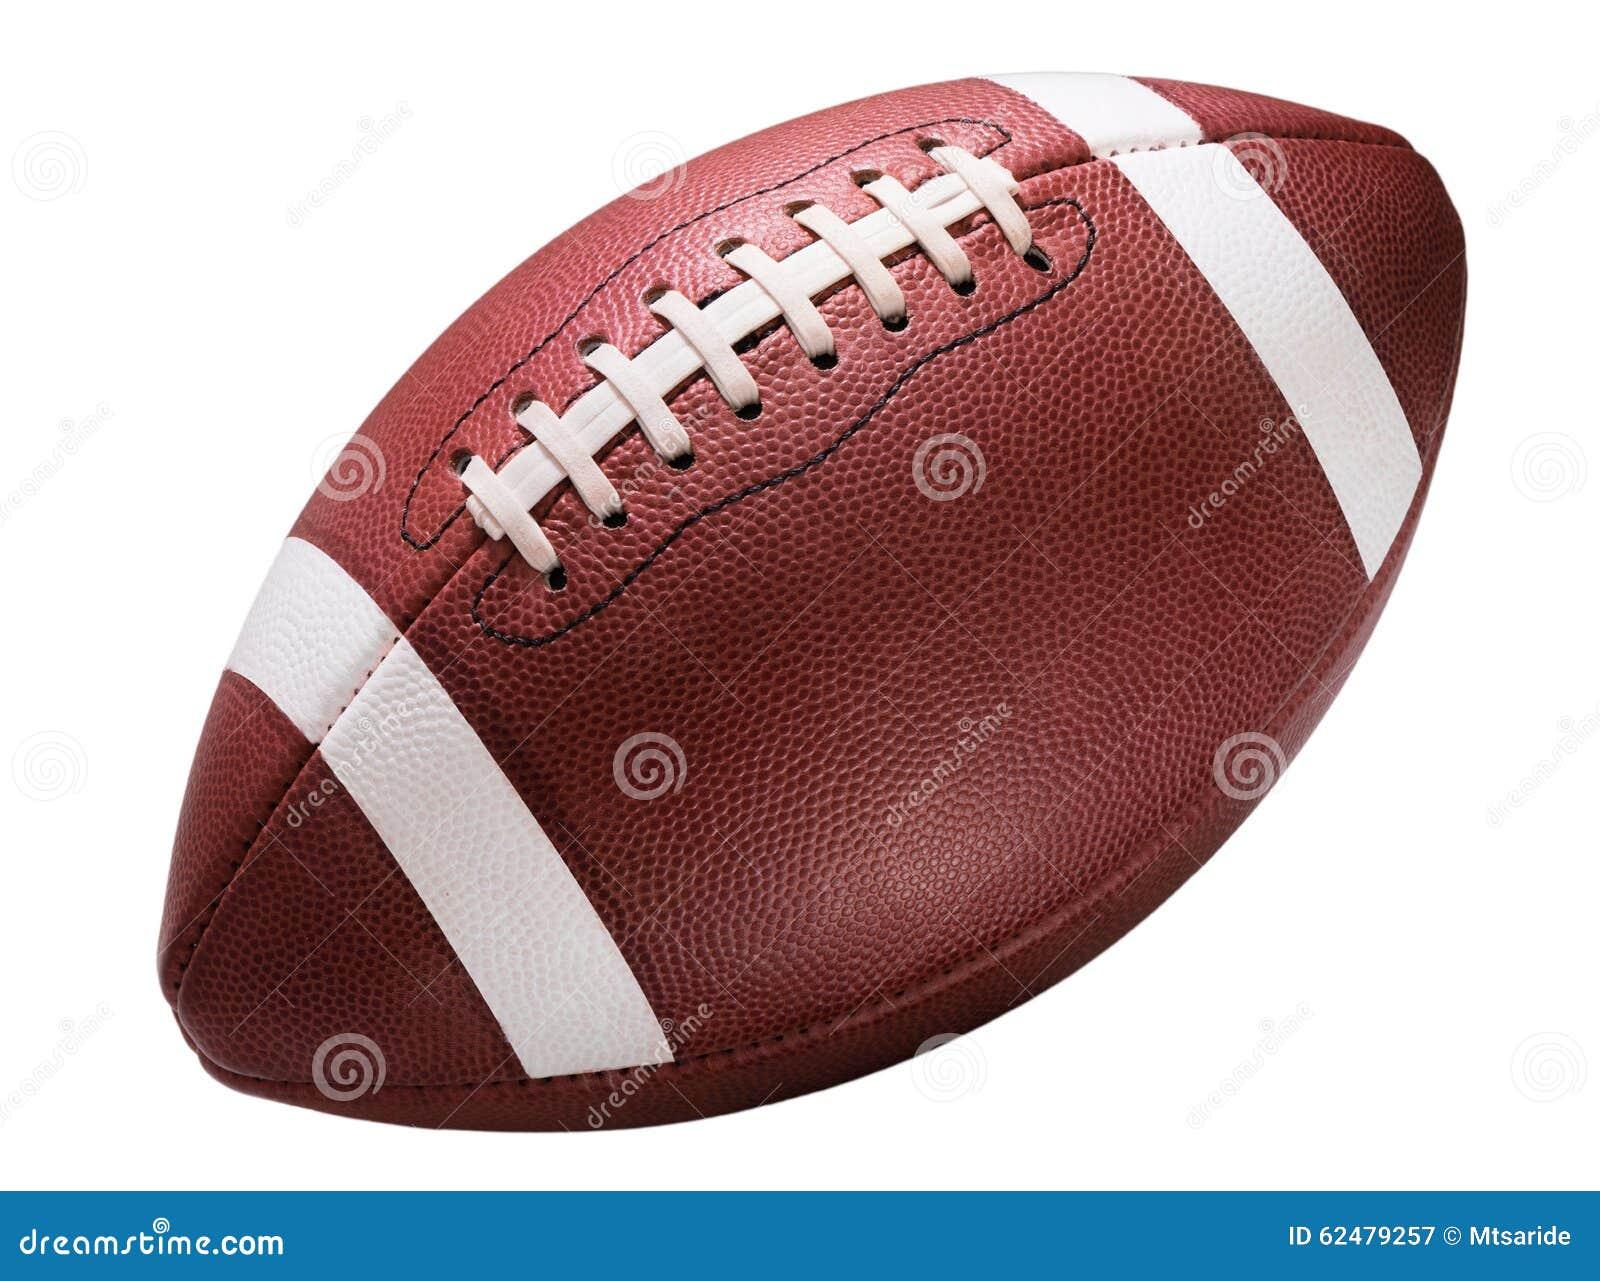 American College High School Junior Football on White